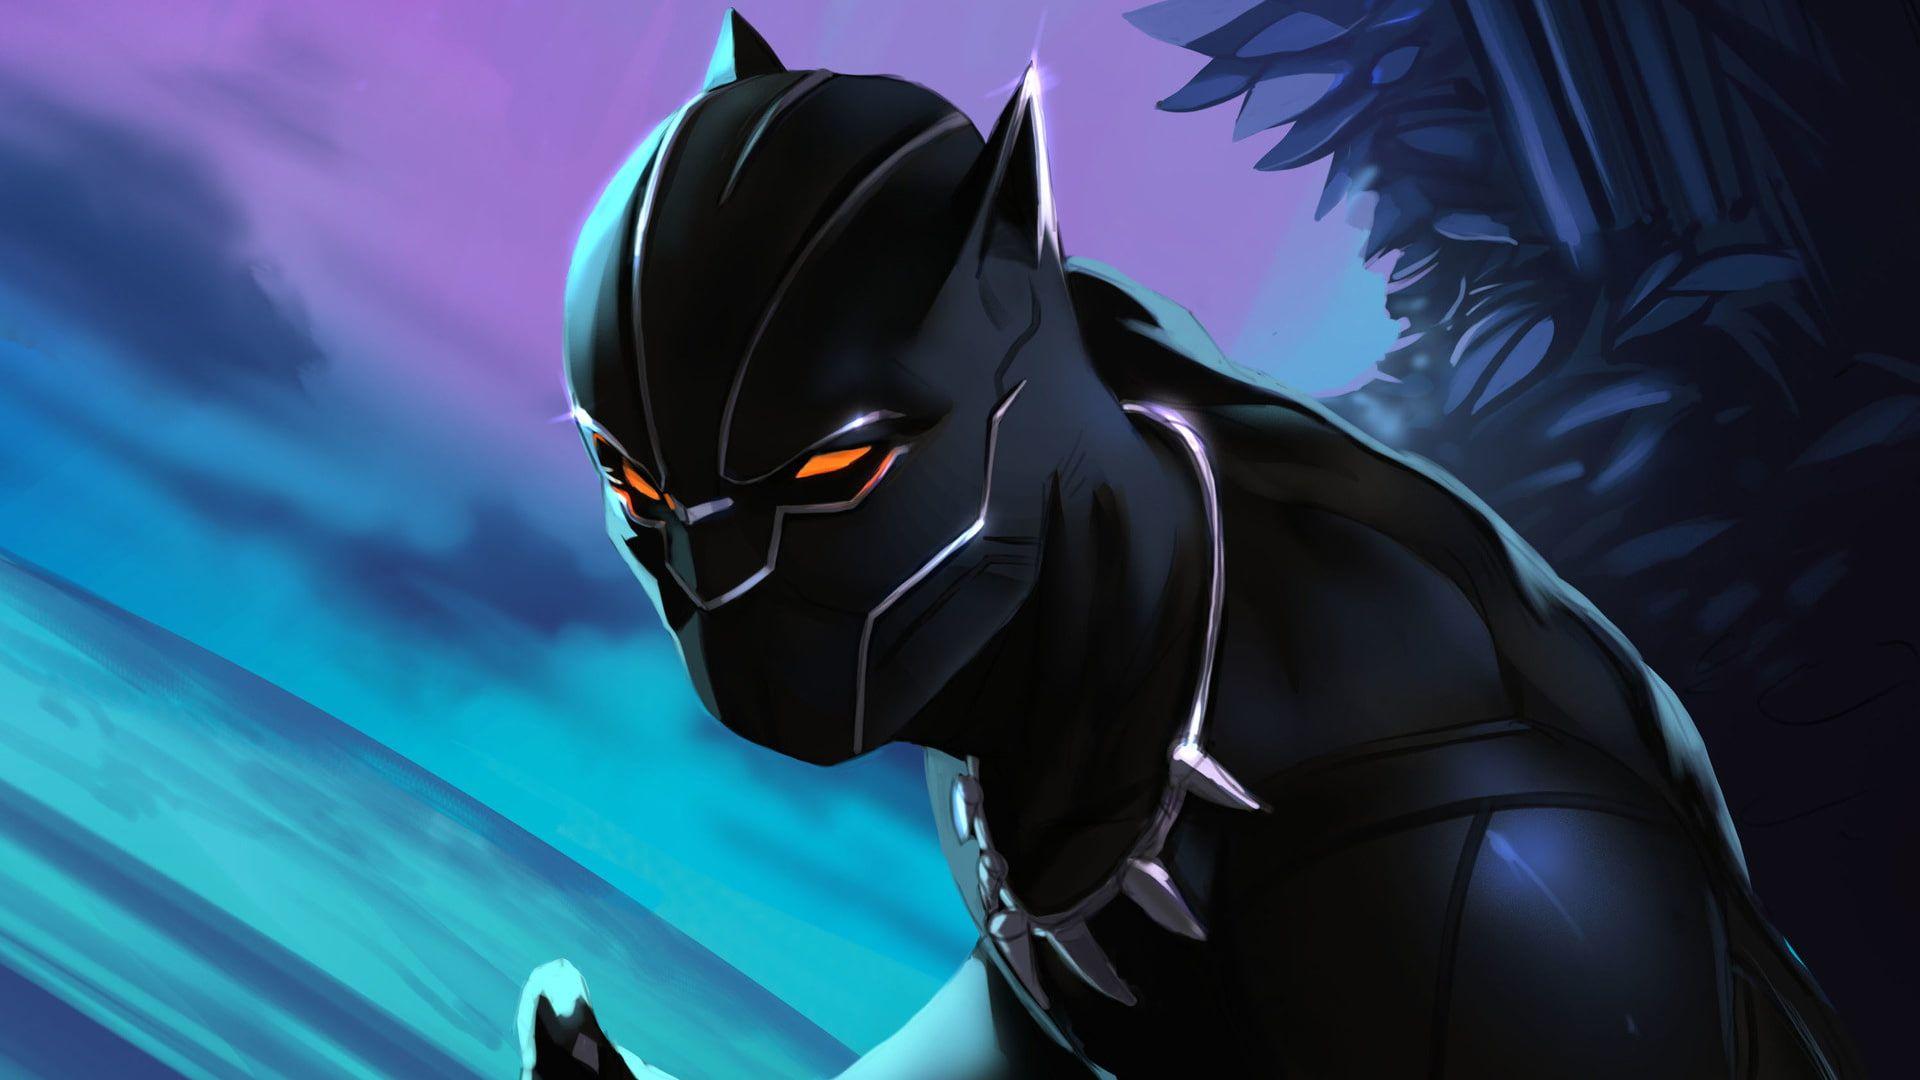 Black Panther Artwork Hd Artist Digital Art Artstation Superheroes 1080p Wallpaper Hdwallpaper Desktop In 2020 Black Panther Artwork Digital Art